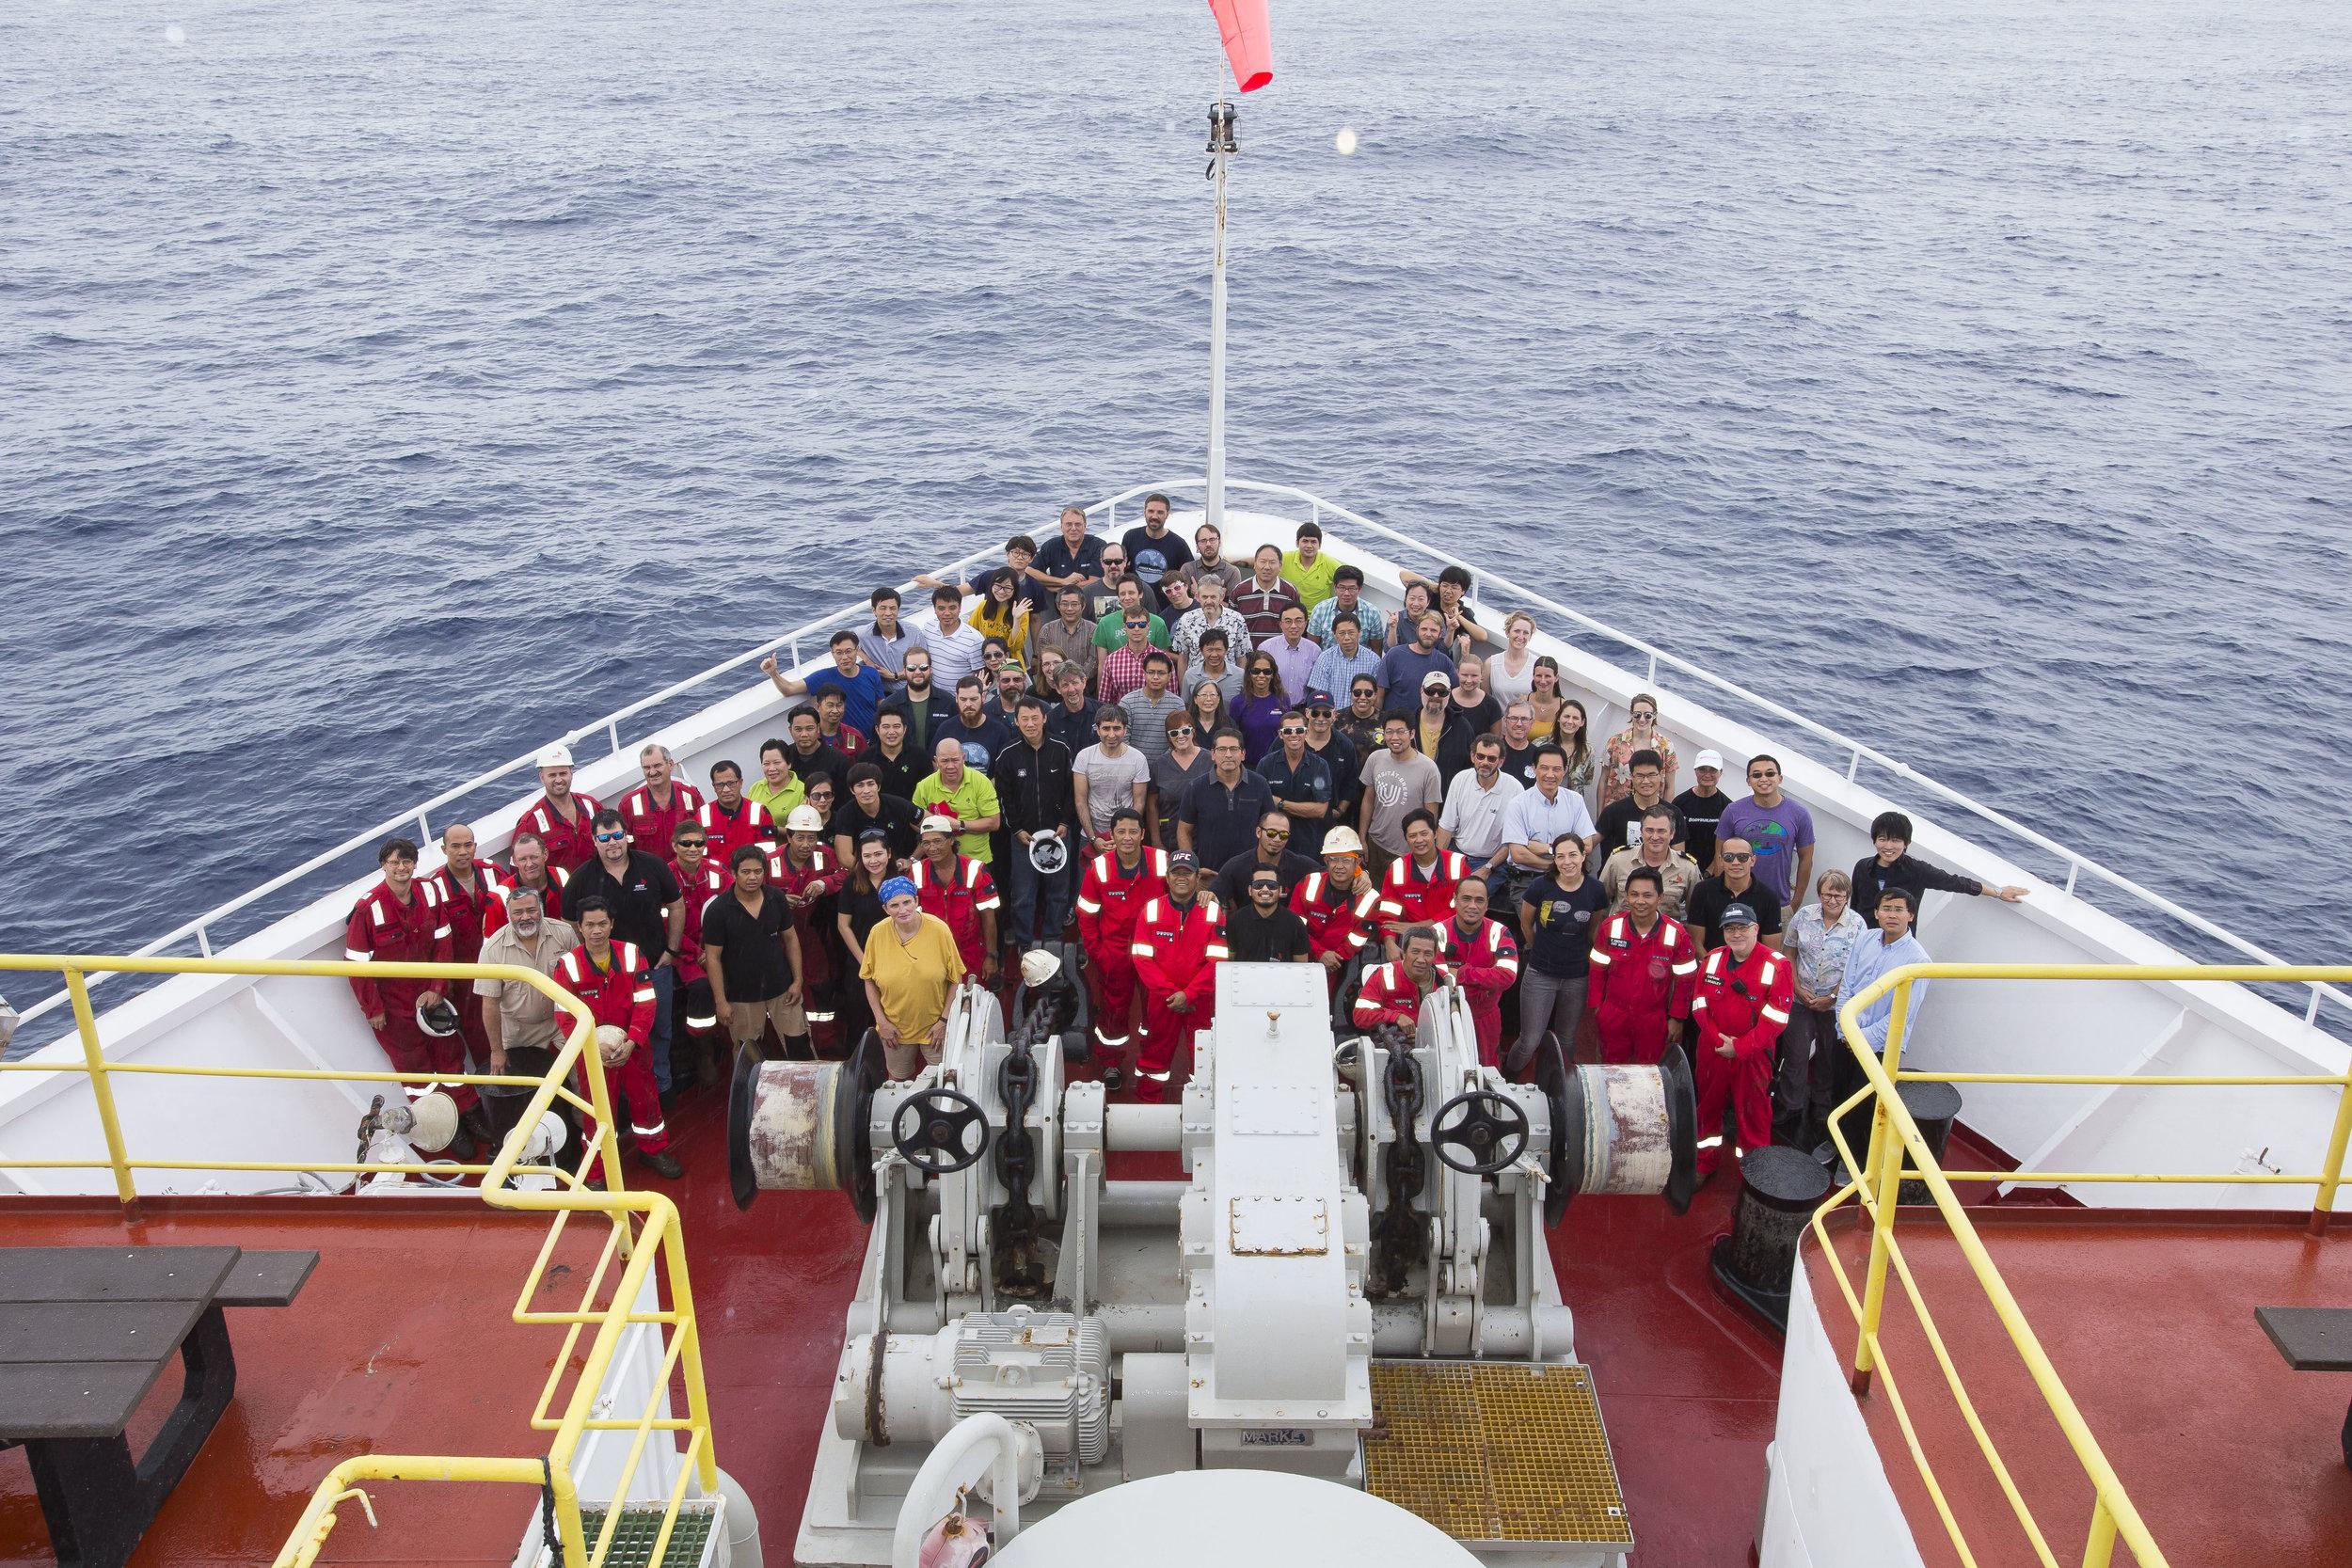 Expedition 368 crew. Photo credit: Tim Fulton, IODP.